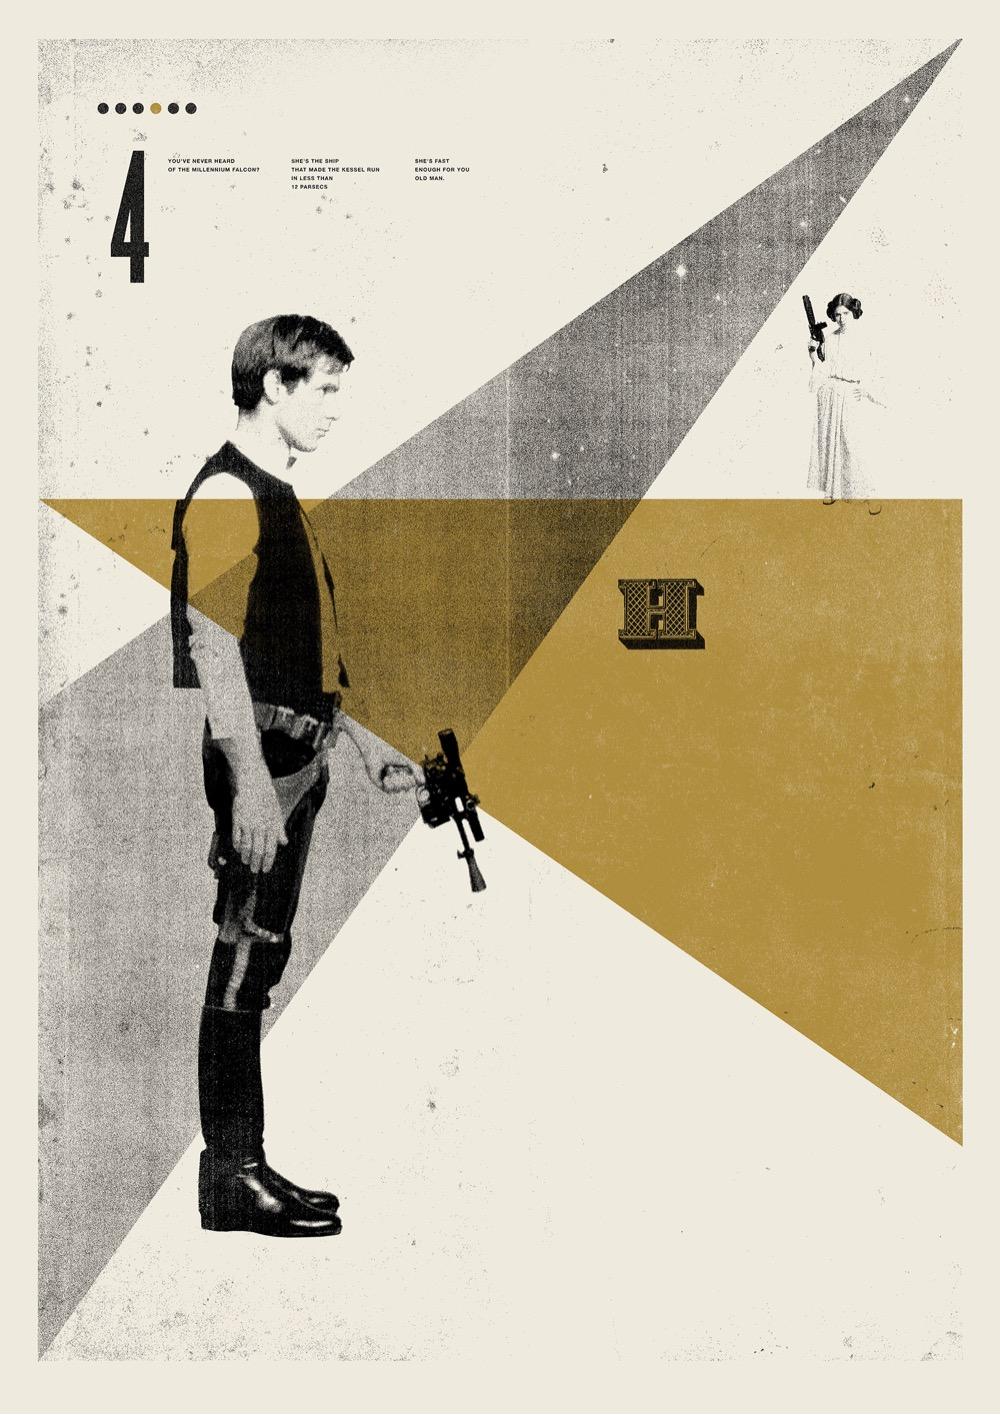 retro modern movie poster for Star Wars